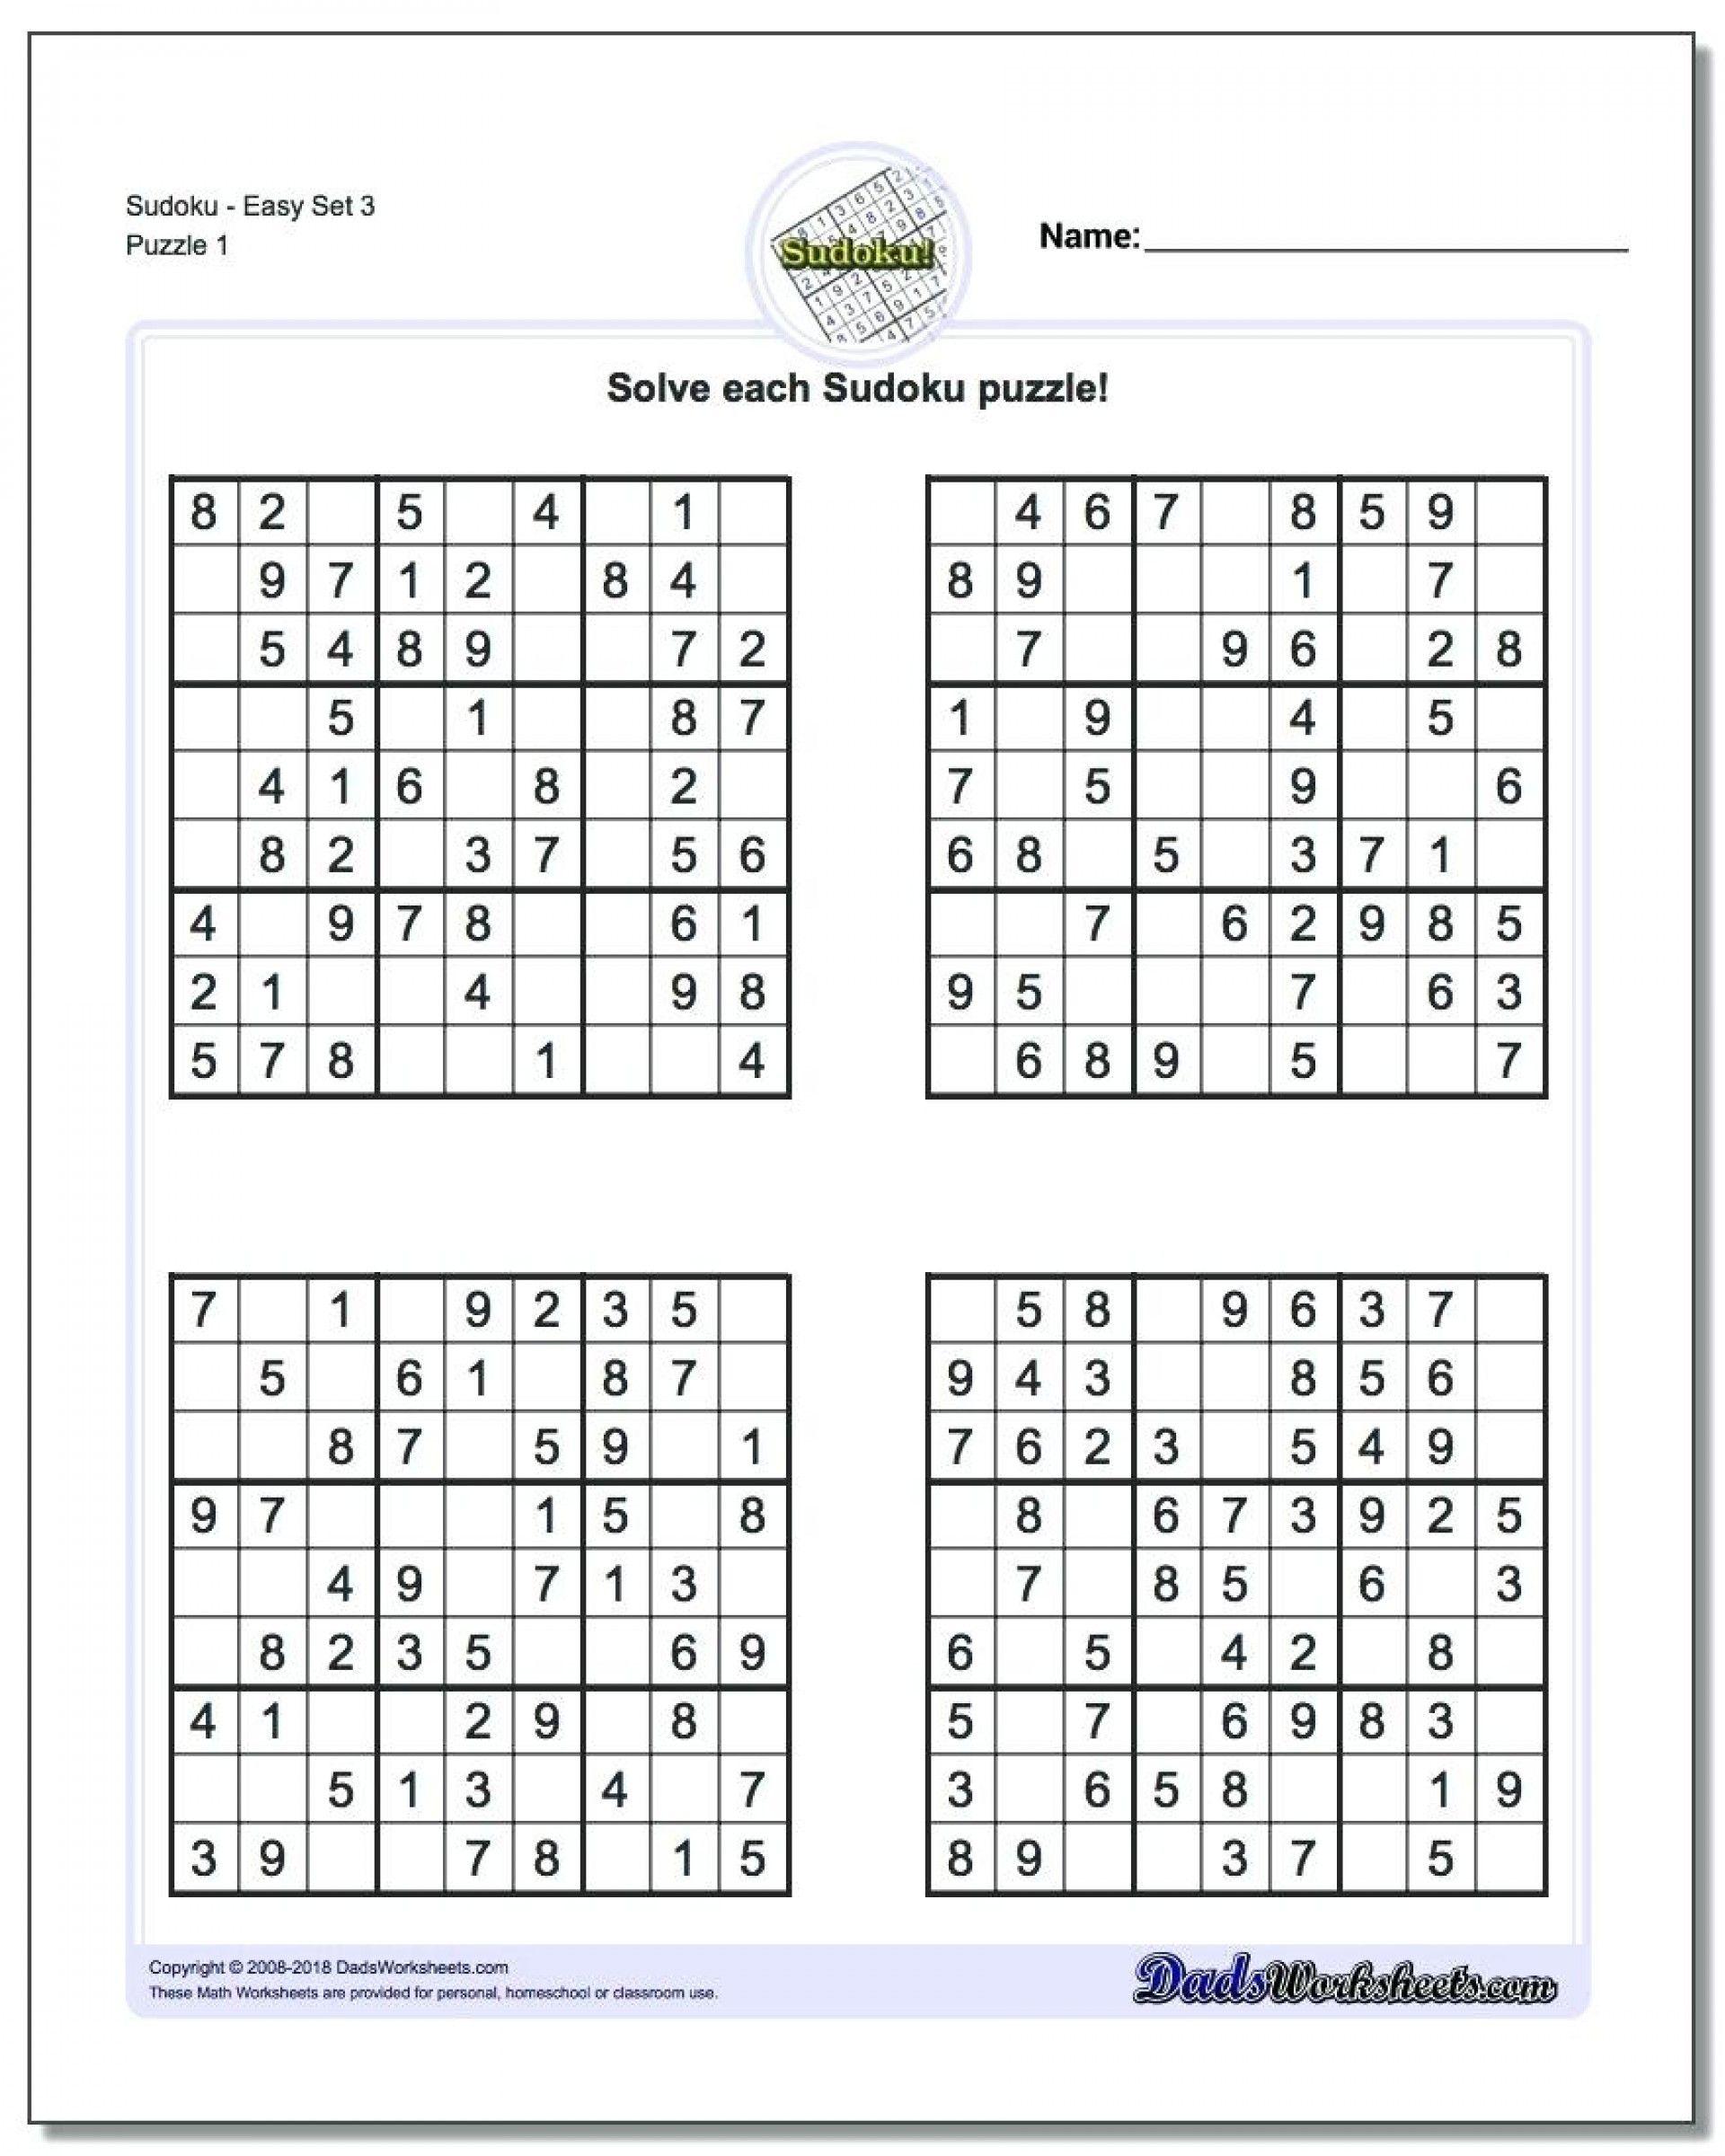 5 Free Math Worksheets Third Grade 3 Fractions And Decimals